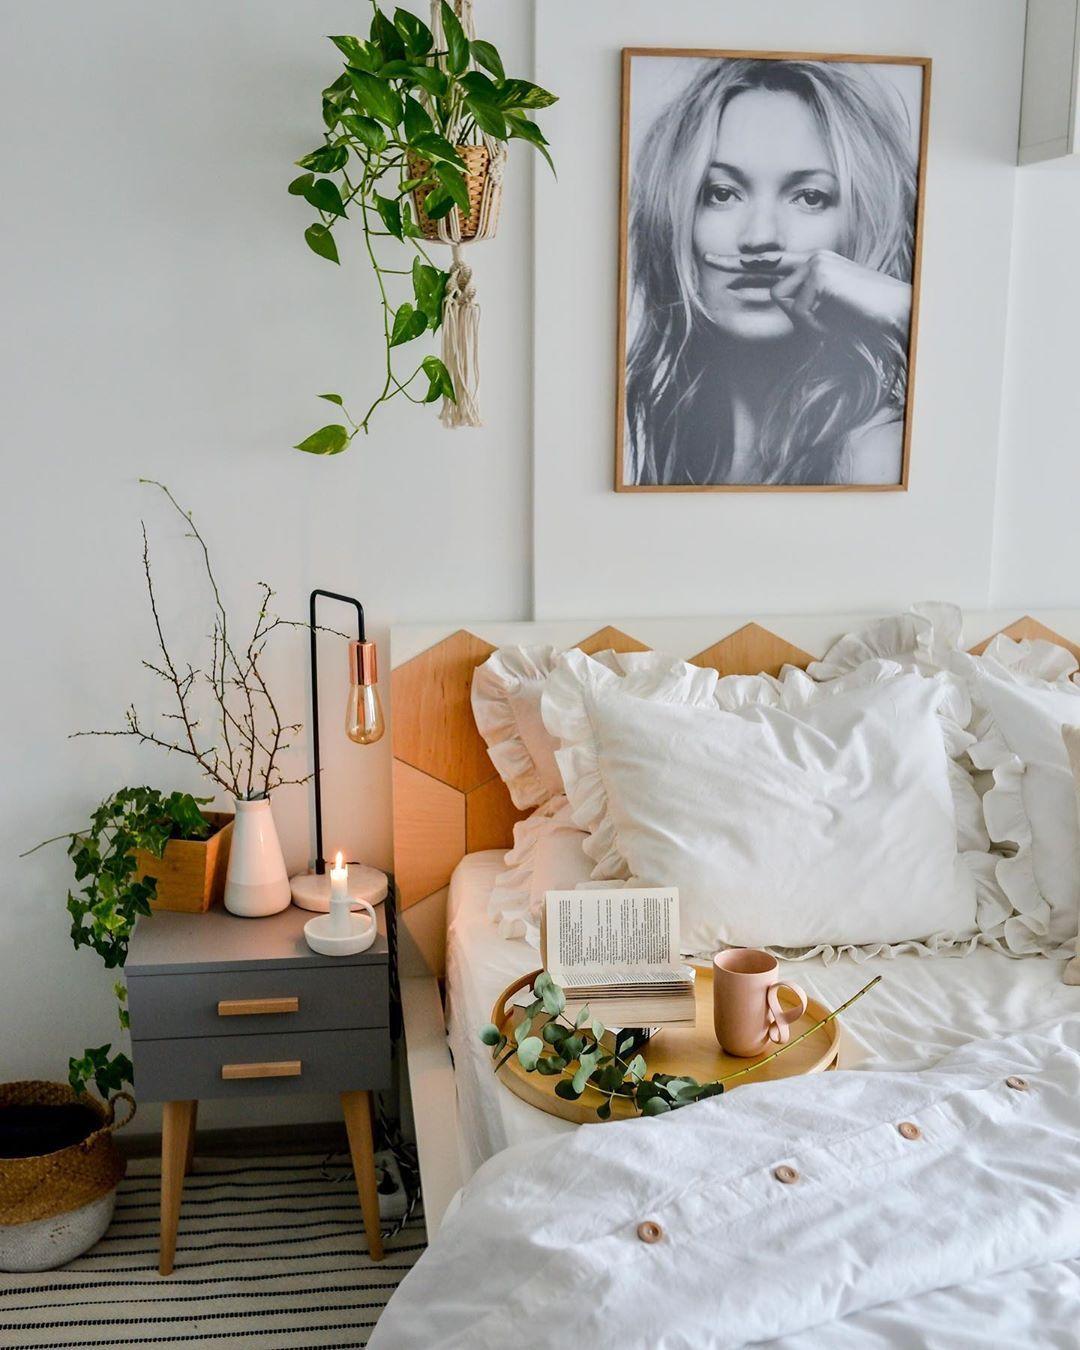 Cozy Candlelit Bedroom Decoration Idea In 2020 Bedroom Inspirations Candlelit Bedroom Interior Design Bedroom